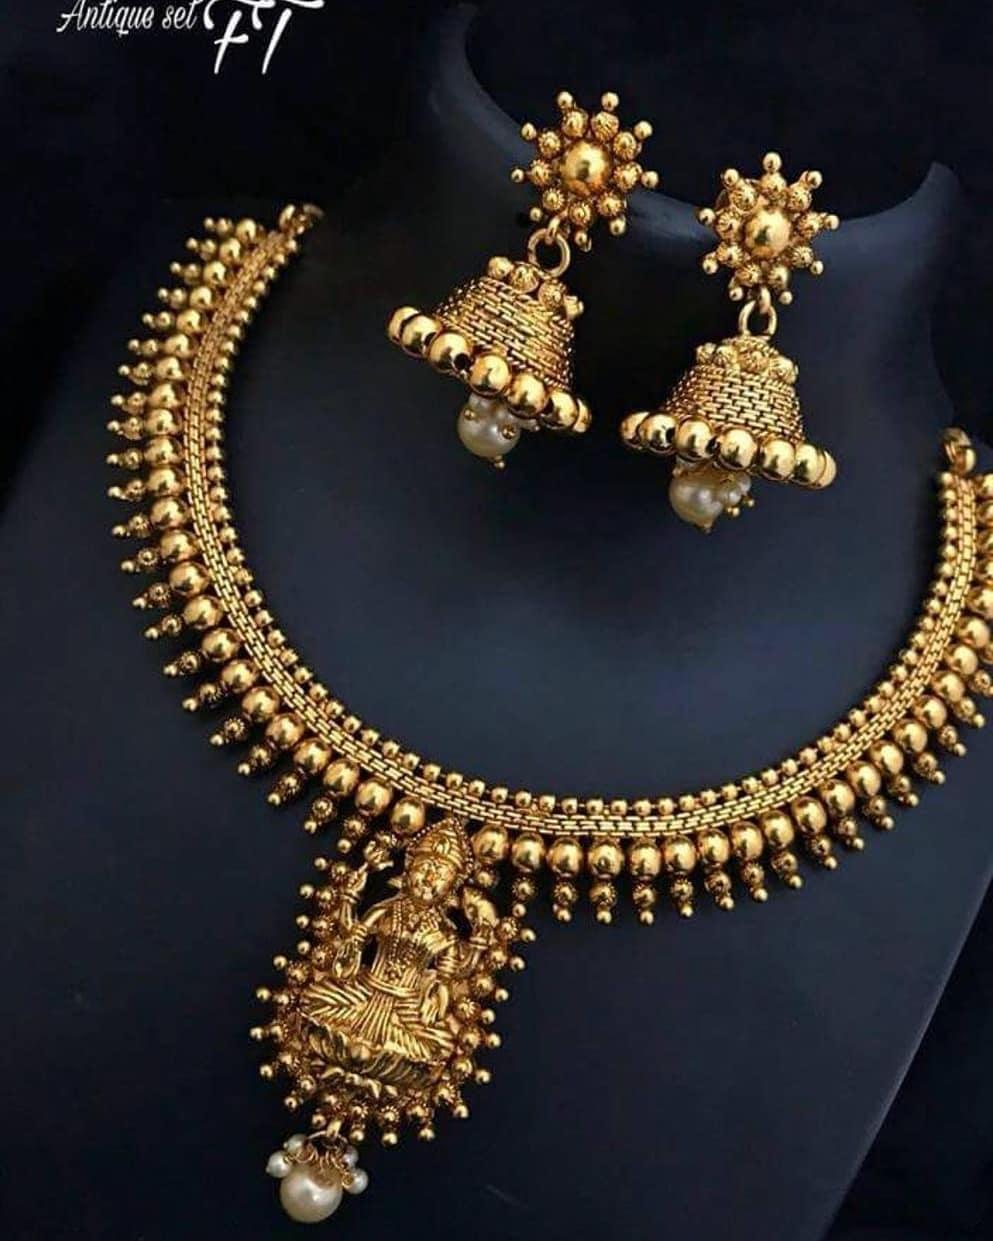 Classic Lakshmi Necklace Set From Dangles Chennai